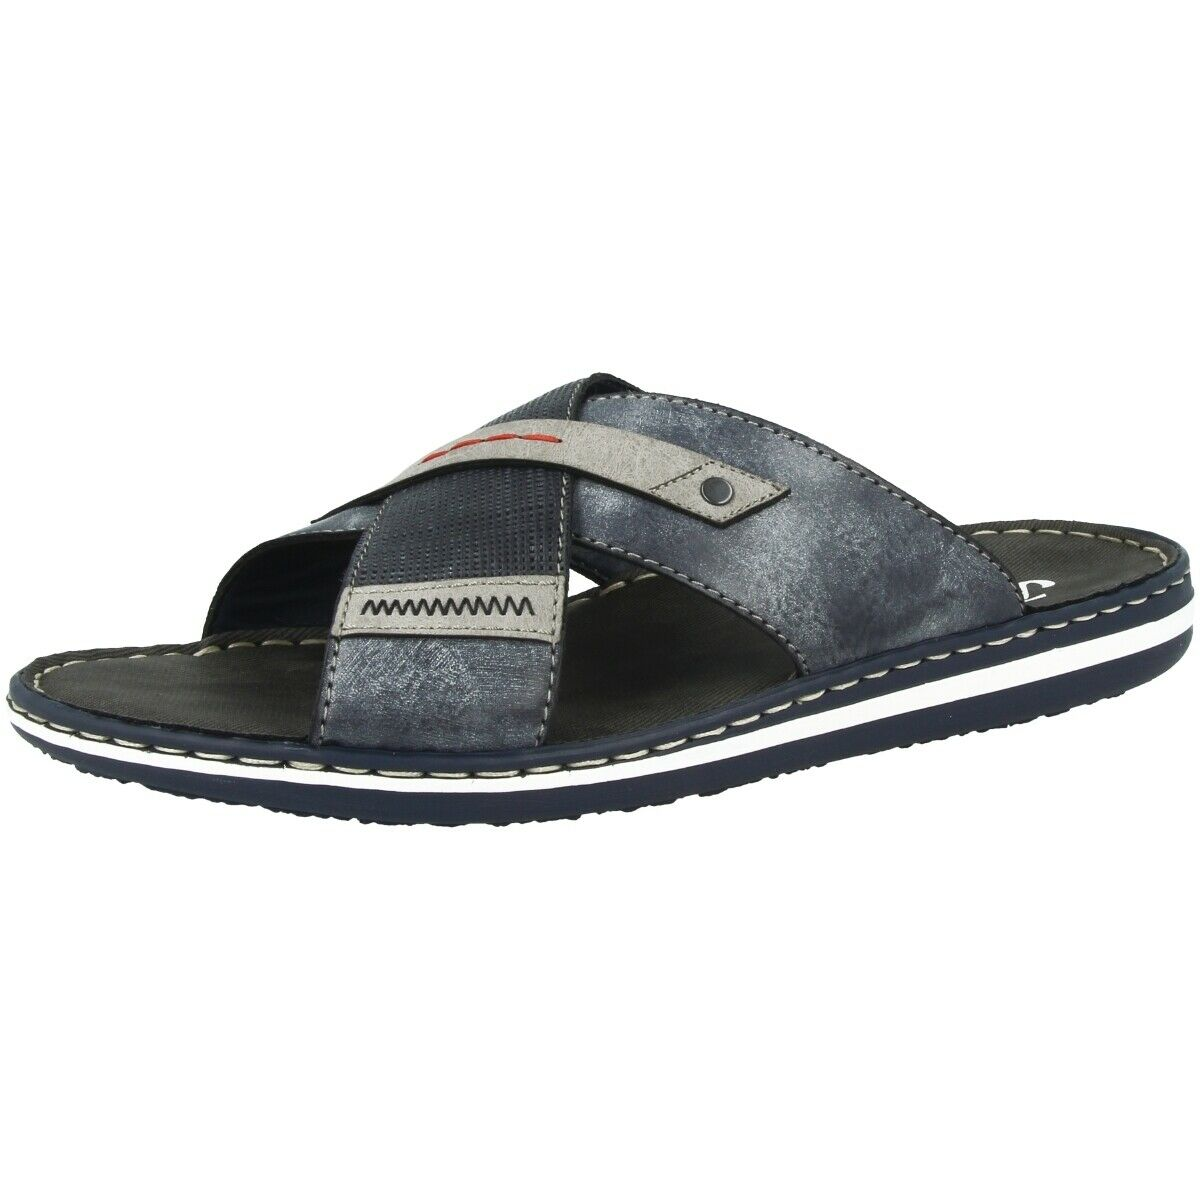 Rieker Serbia-Niagara shoes Sandals Mules Slipper Slippers 21057-14